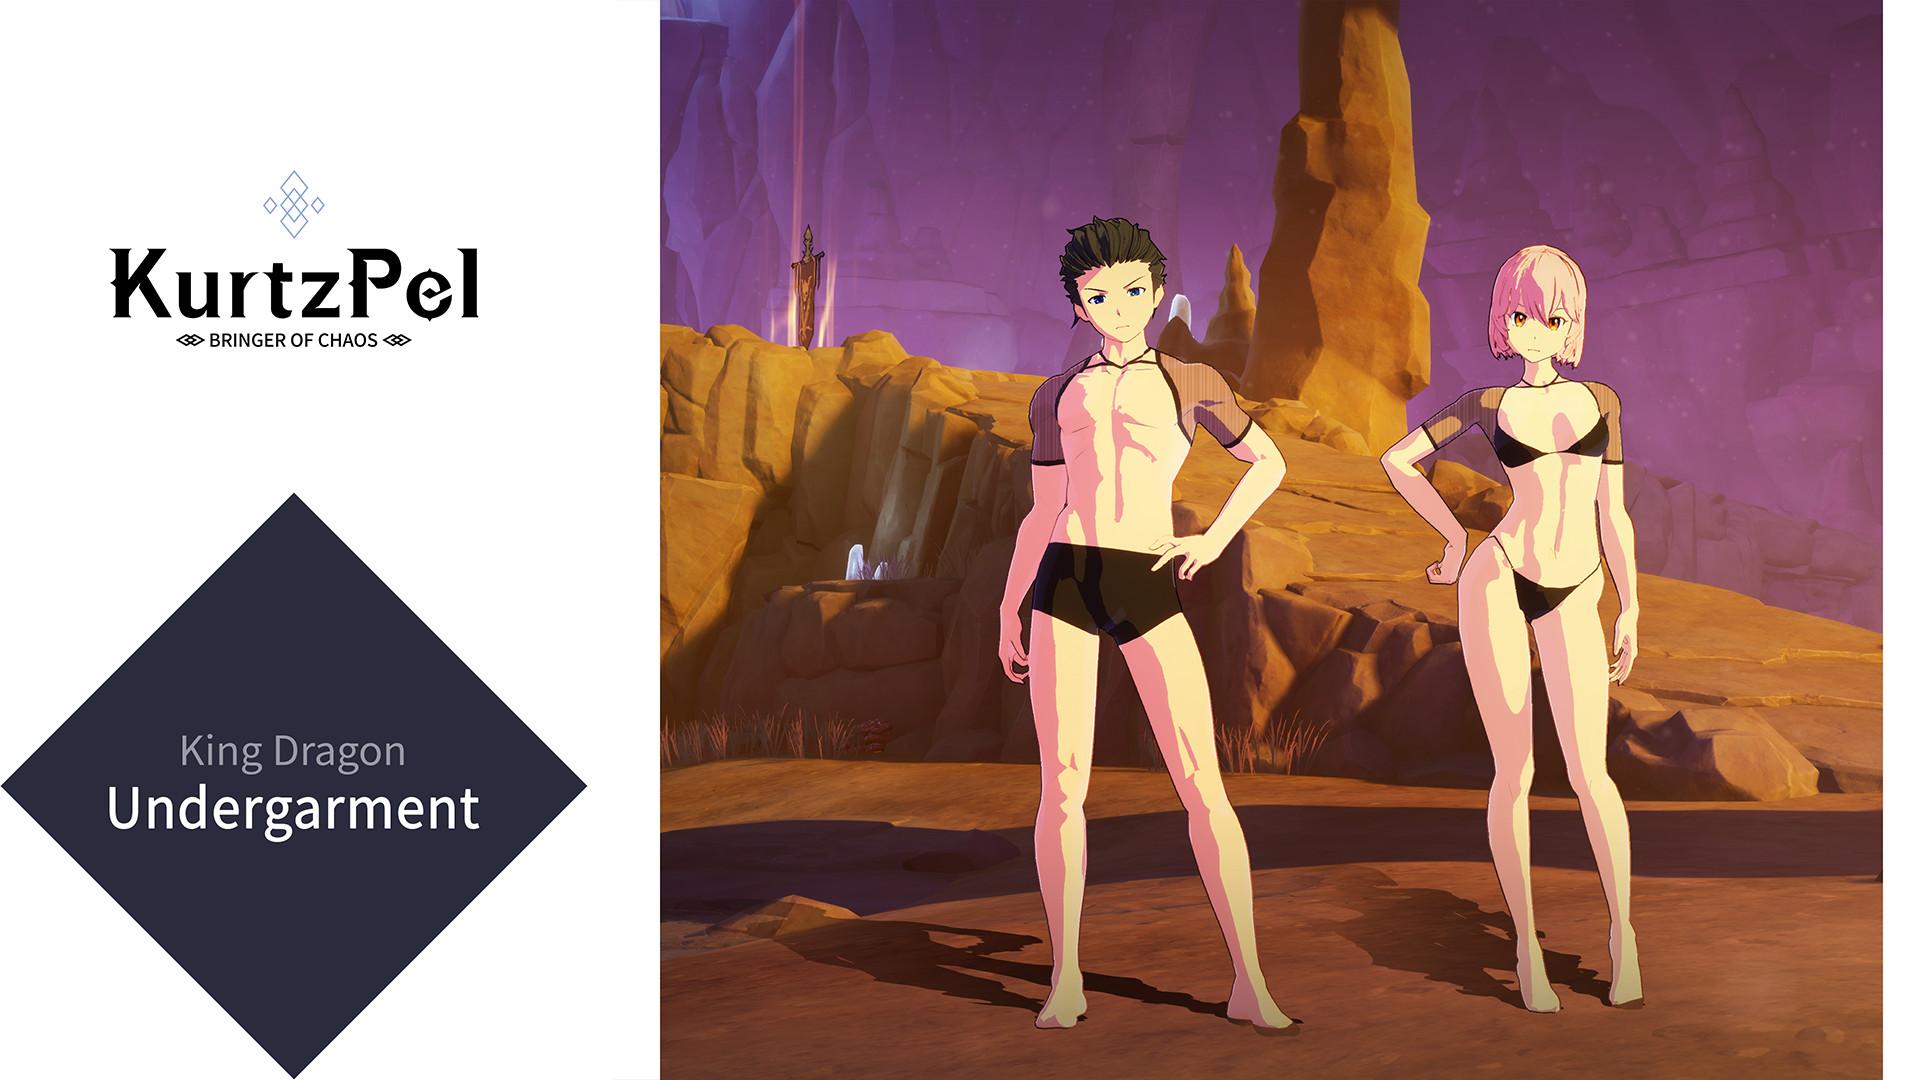 KurtzPel - King Dragon Undergarment screenshot